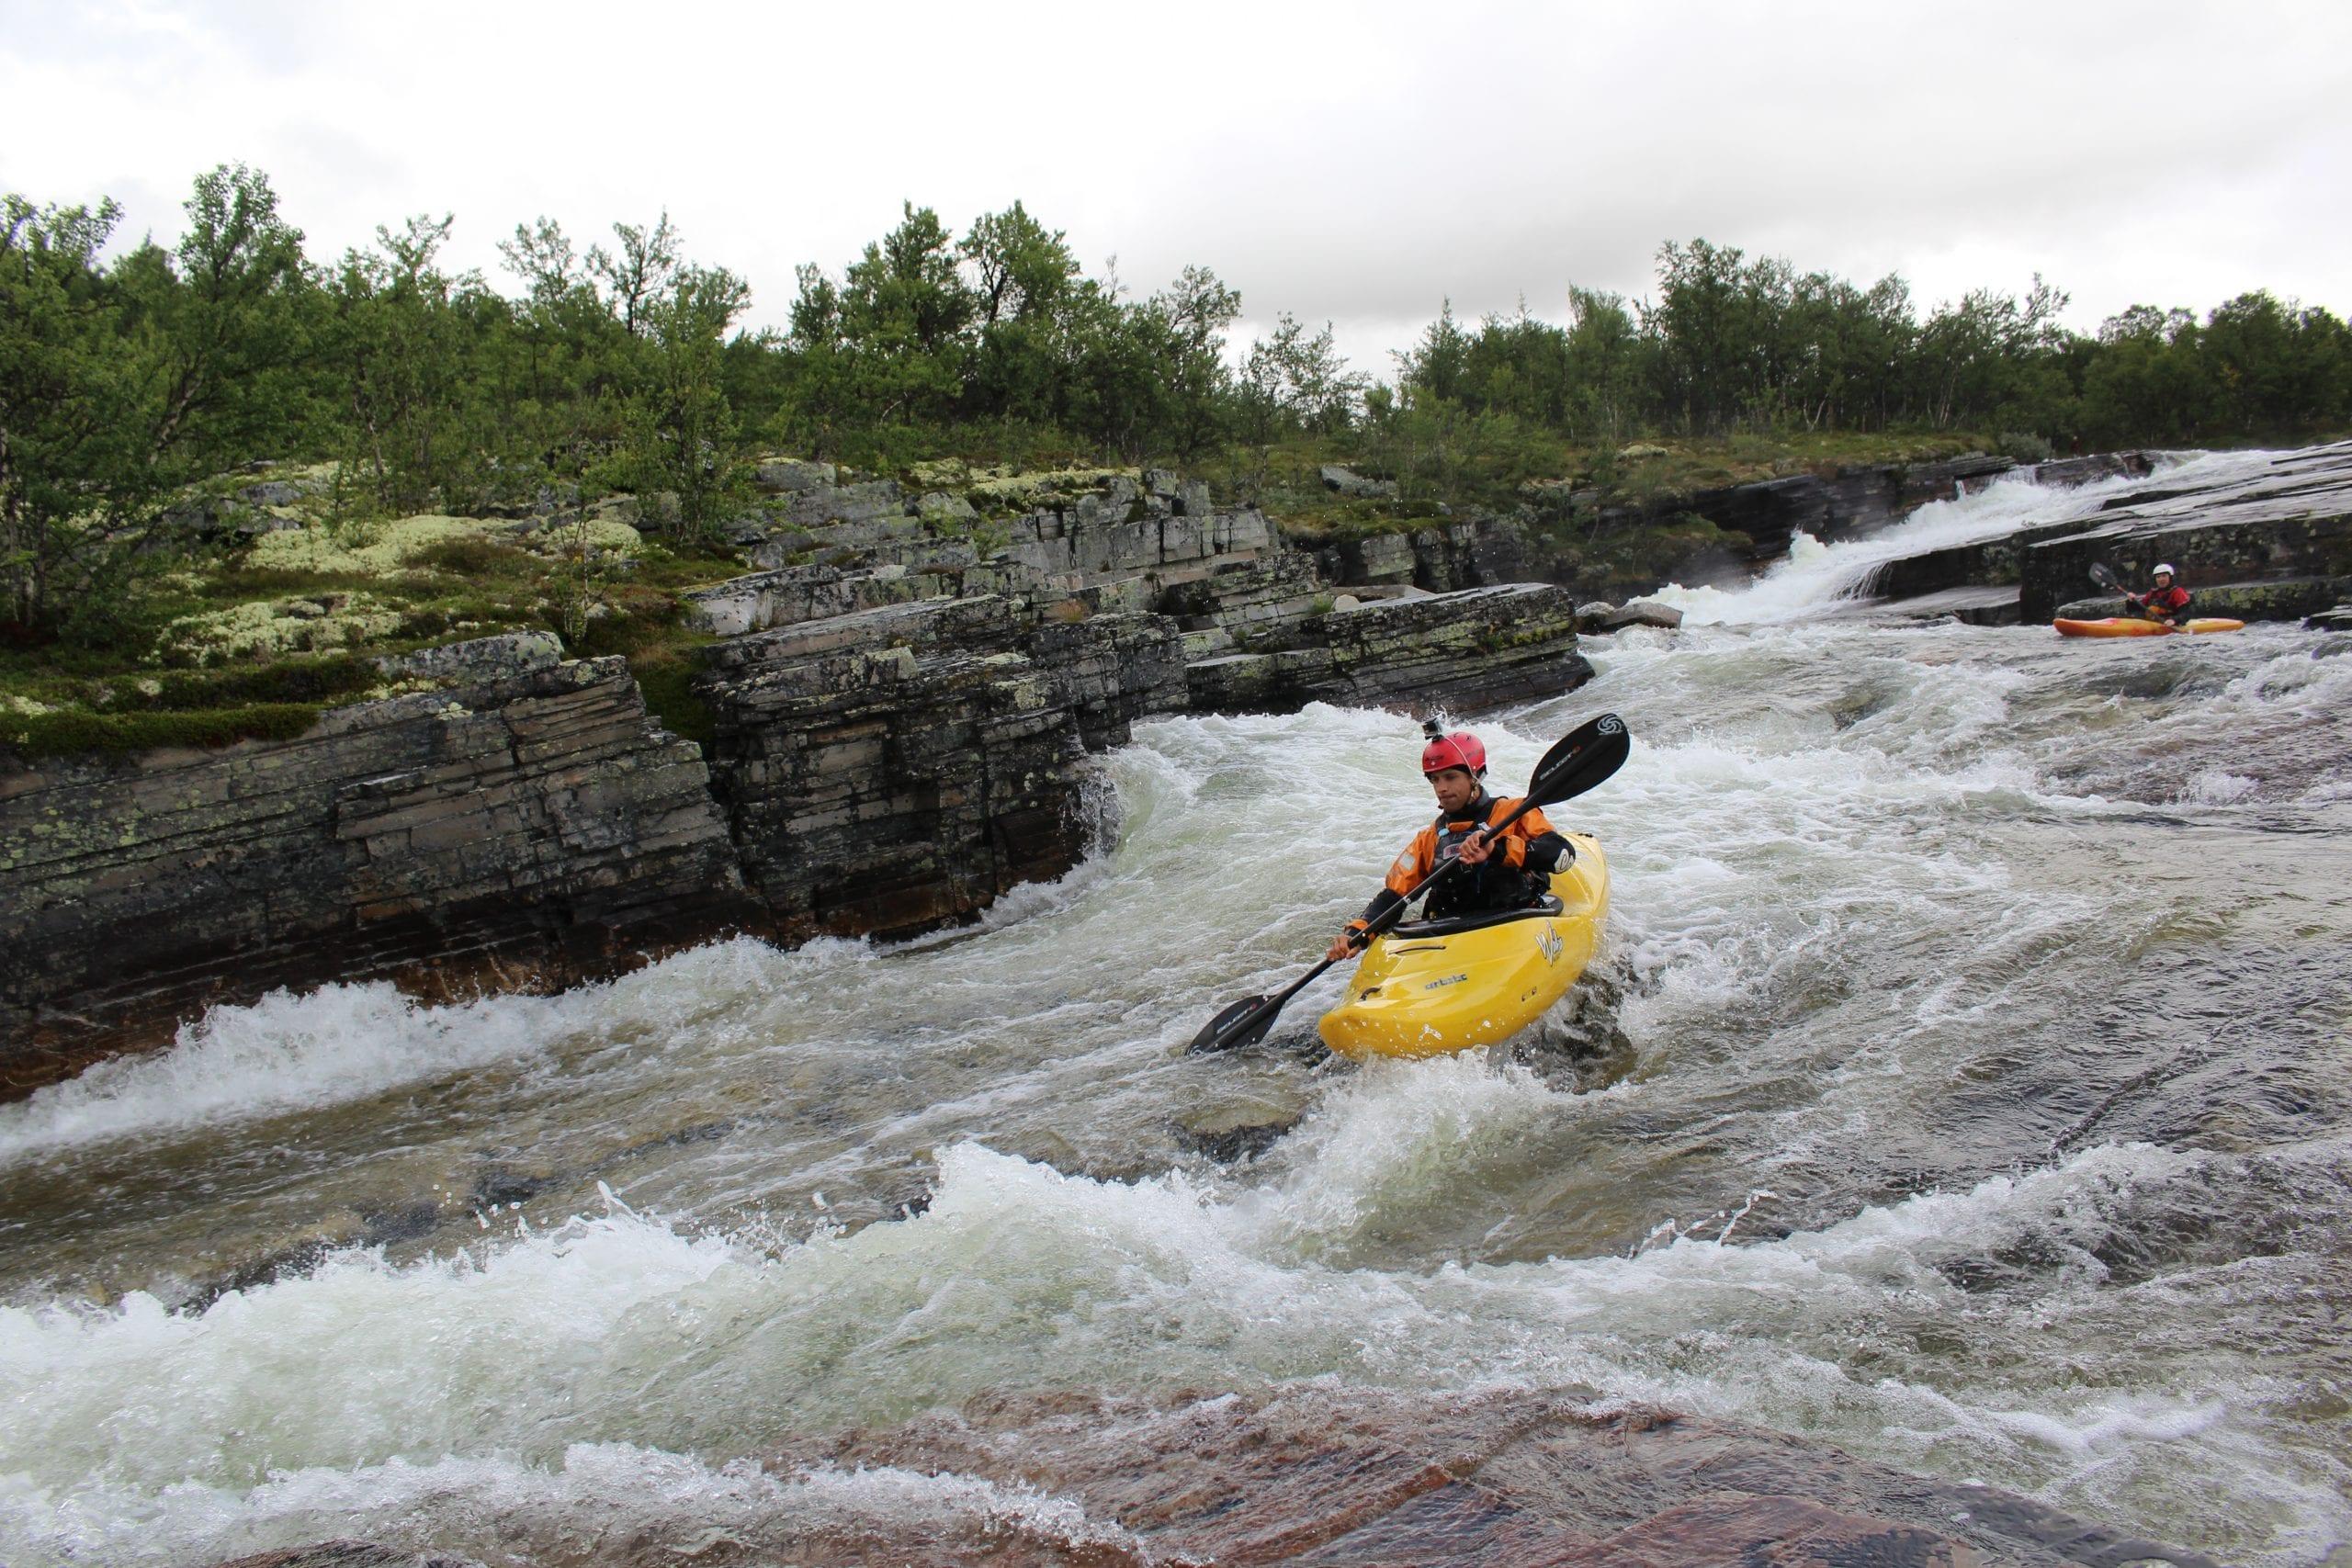 Kayaking on Ula River - main slide section